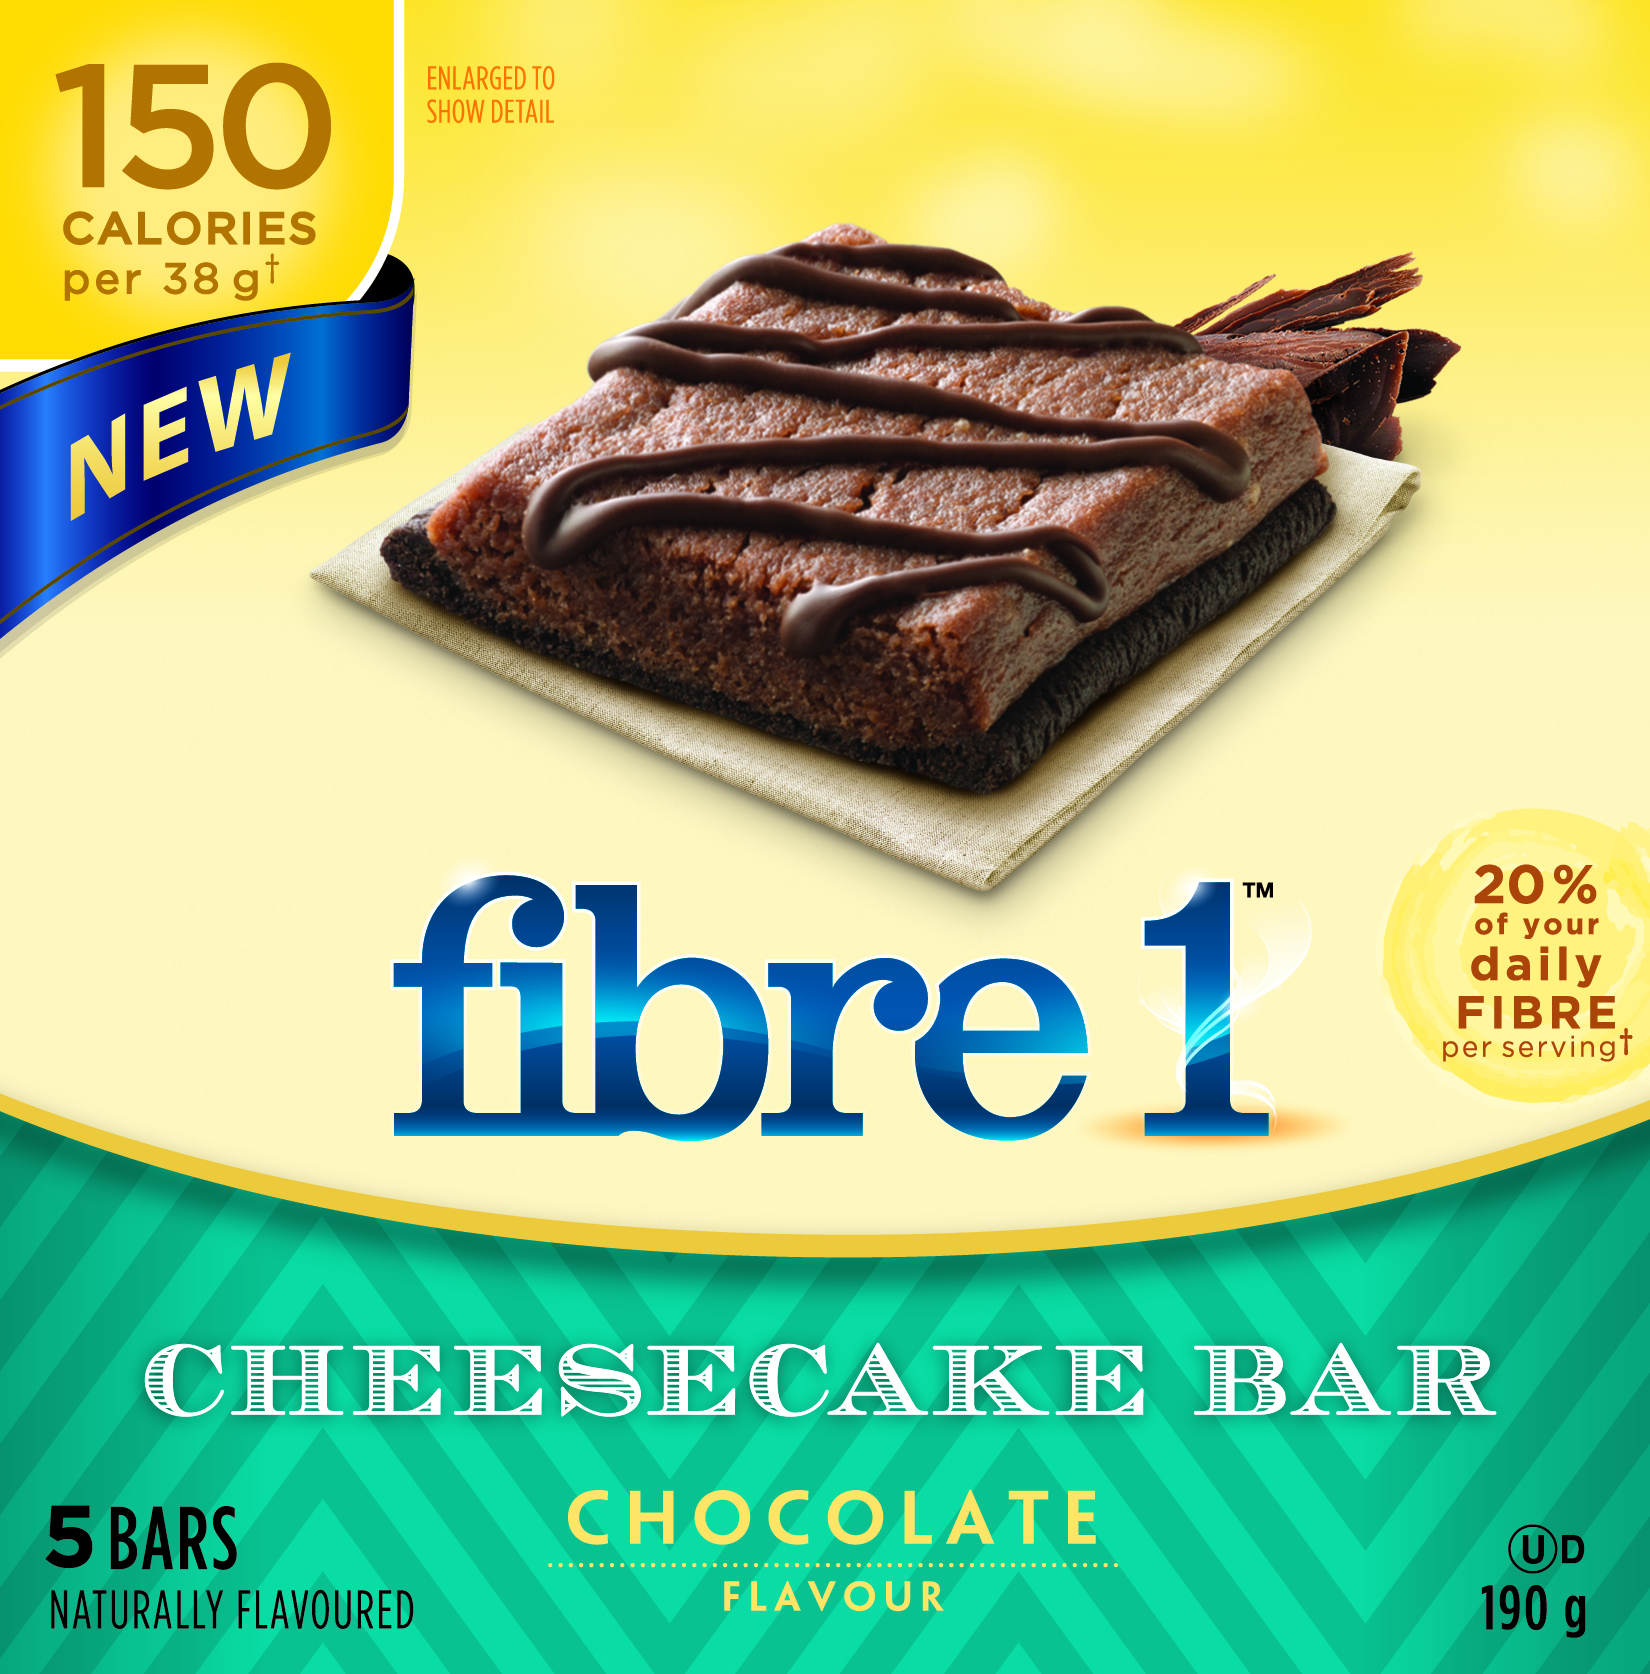 Fibre1 Cheesecake Bars